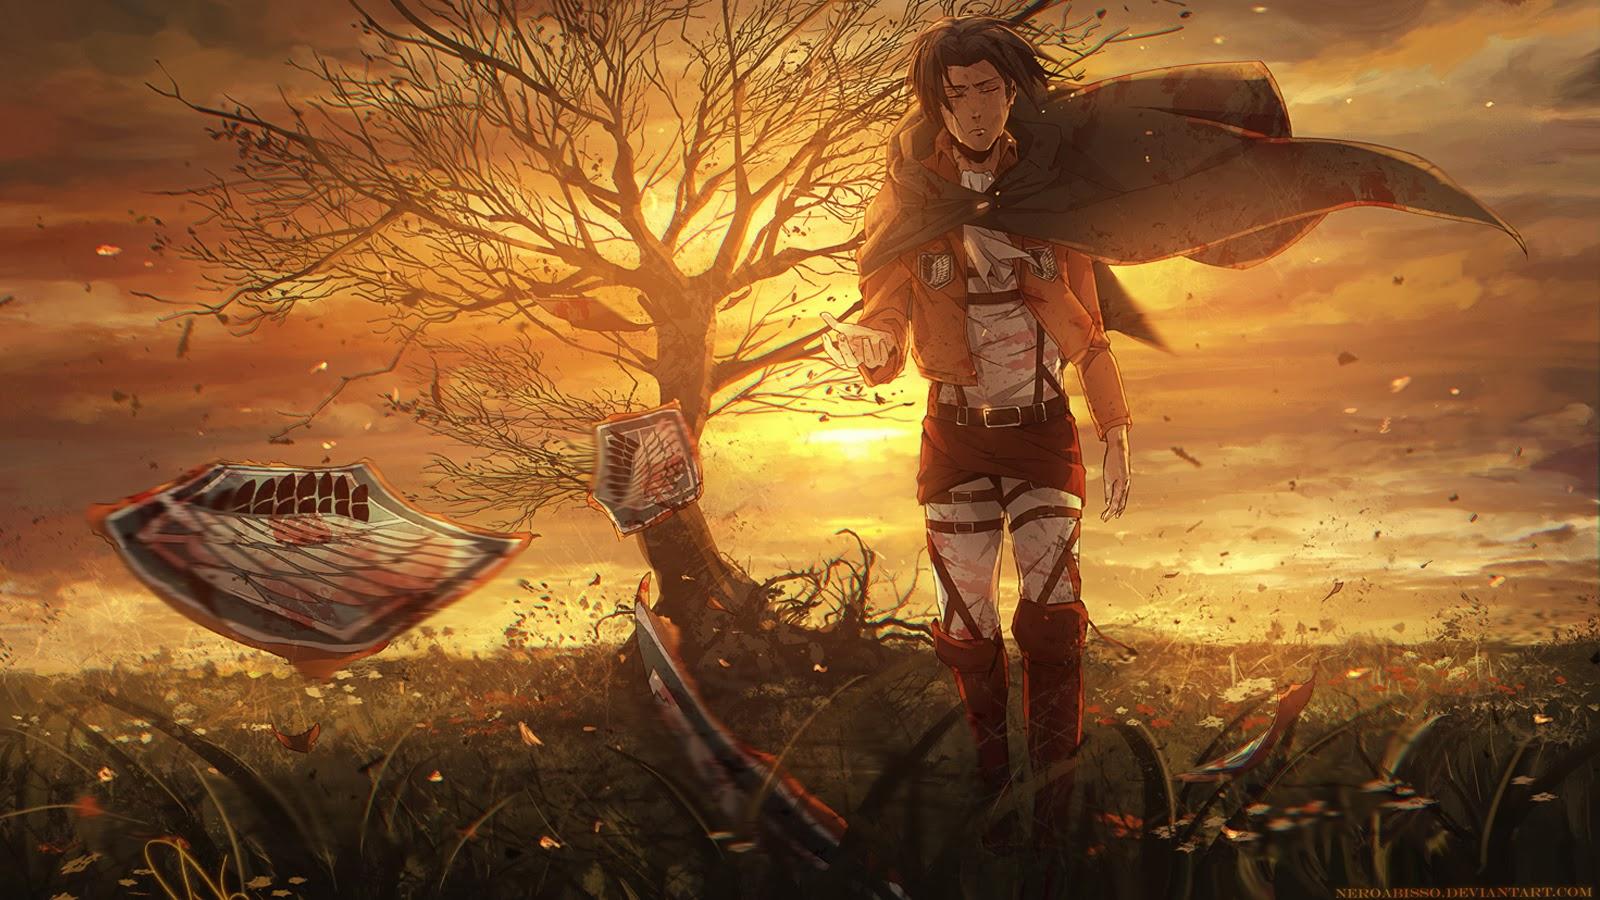 Scouting Legion Attack on Titan Shingeki no Kyojin Anime Wallpaper 1600x900